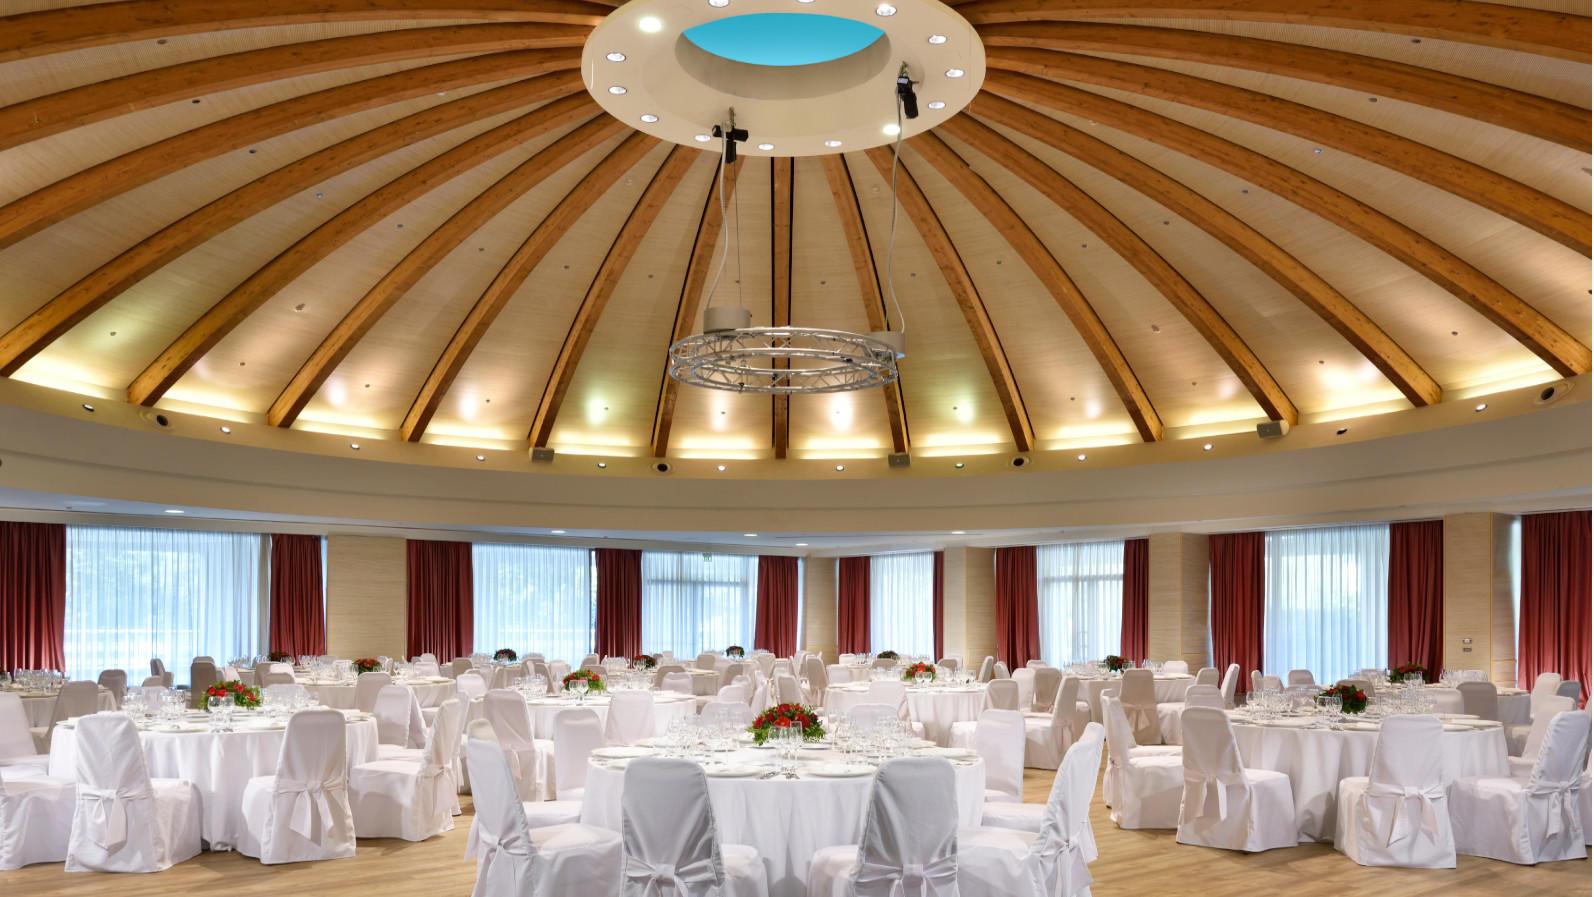 Asia Meeting Room | Expo Fiera Milano